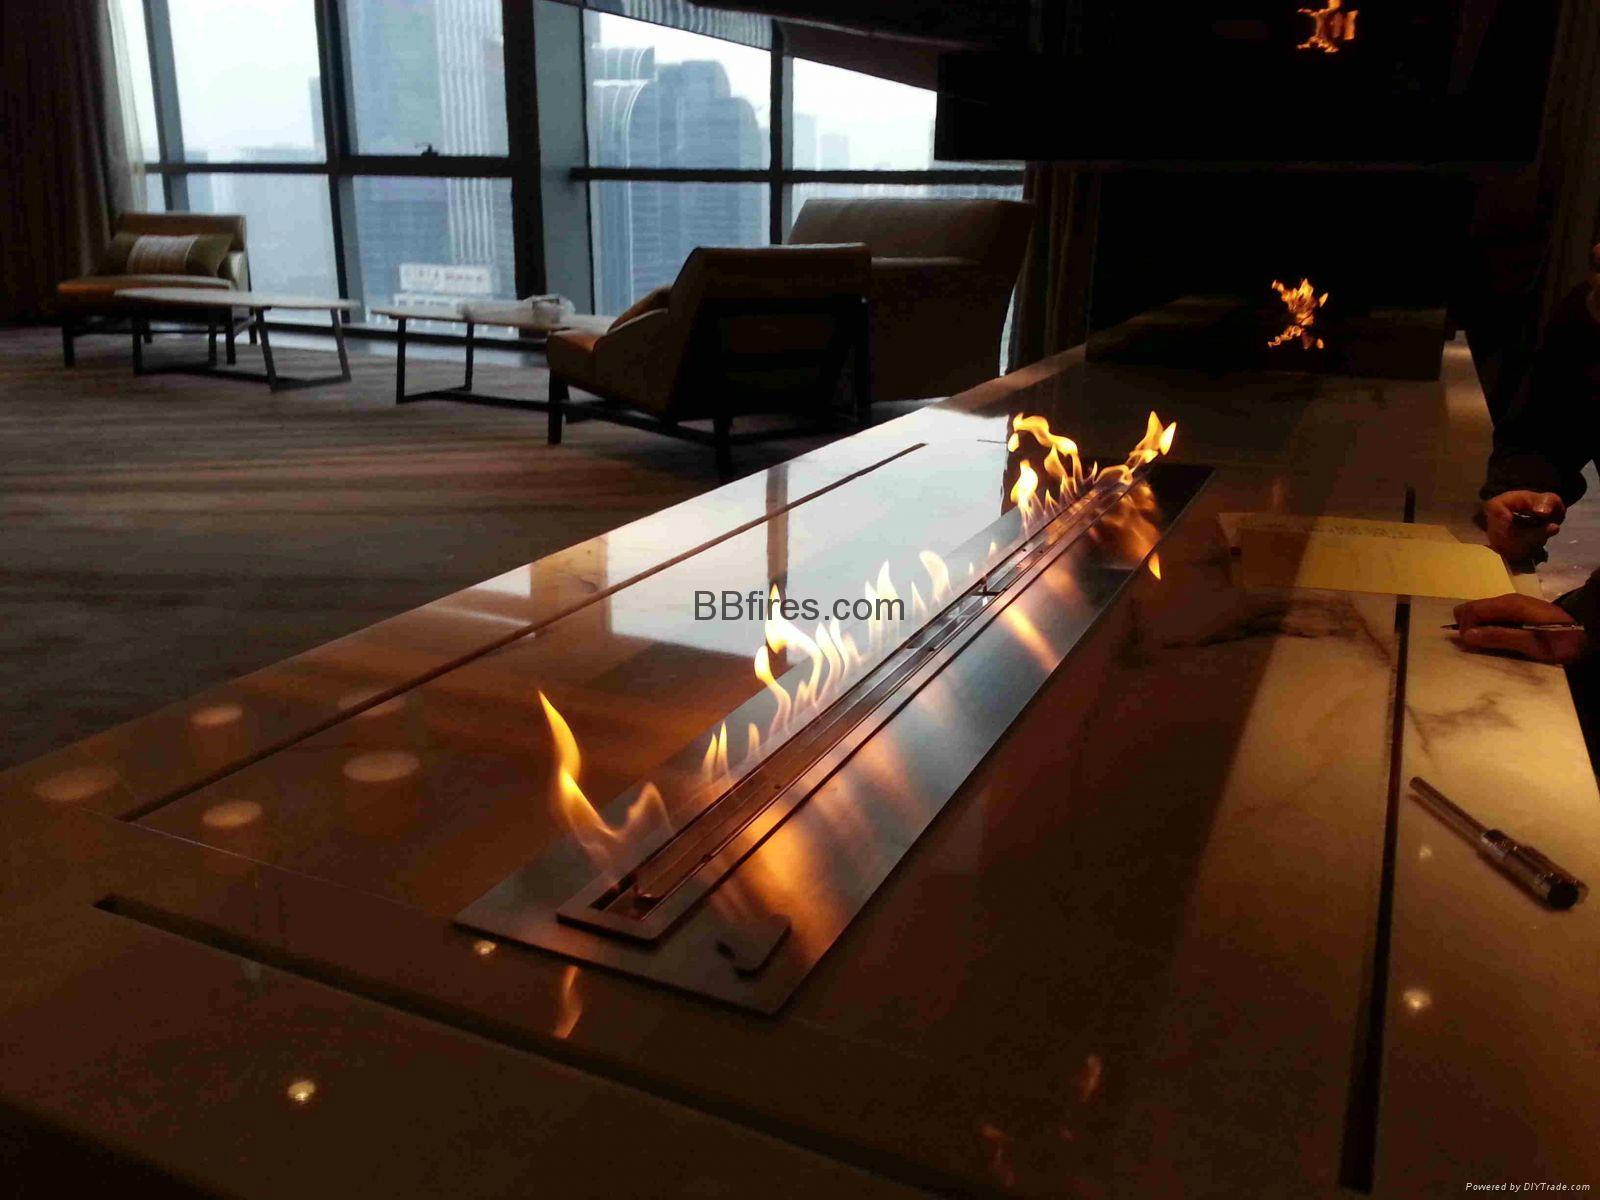 BB bio-ethanol imtelligent fireplaces in Four Season Hotel